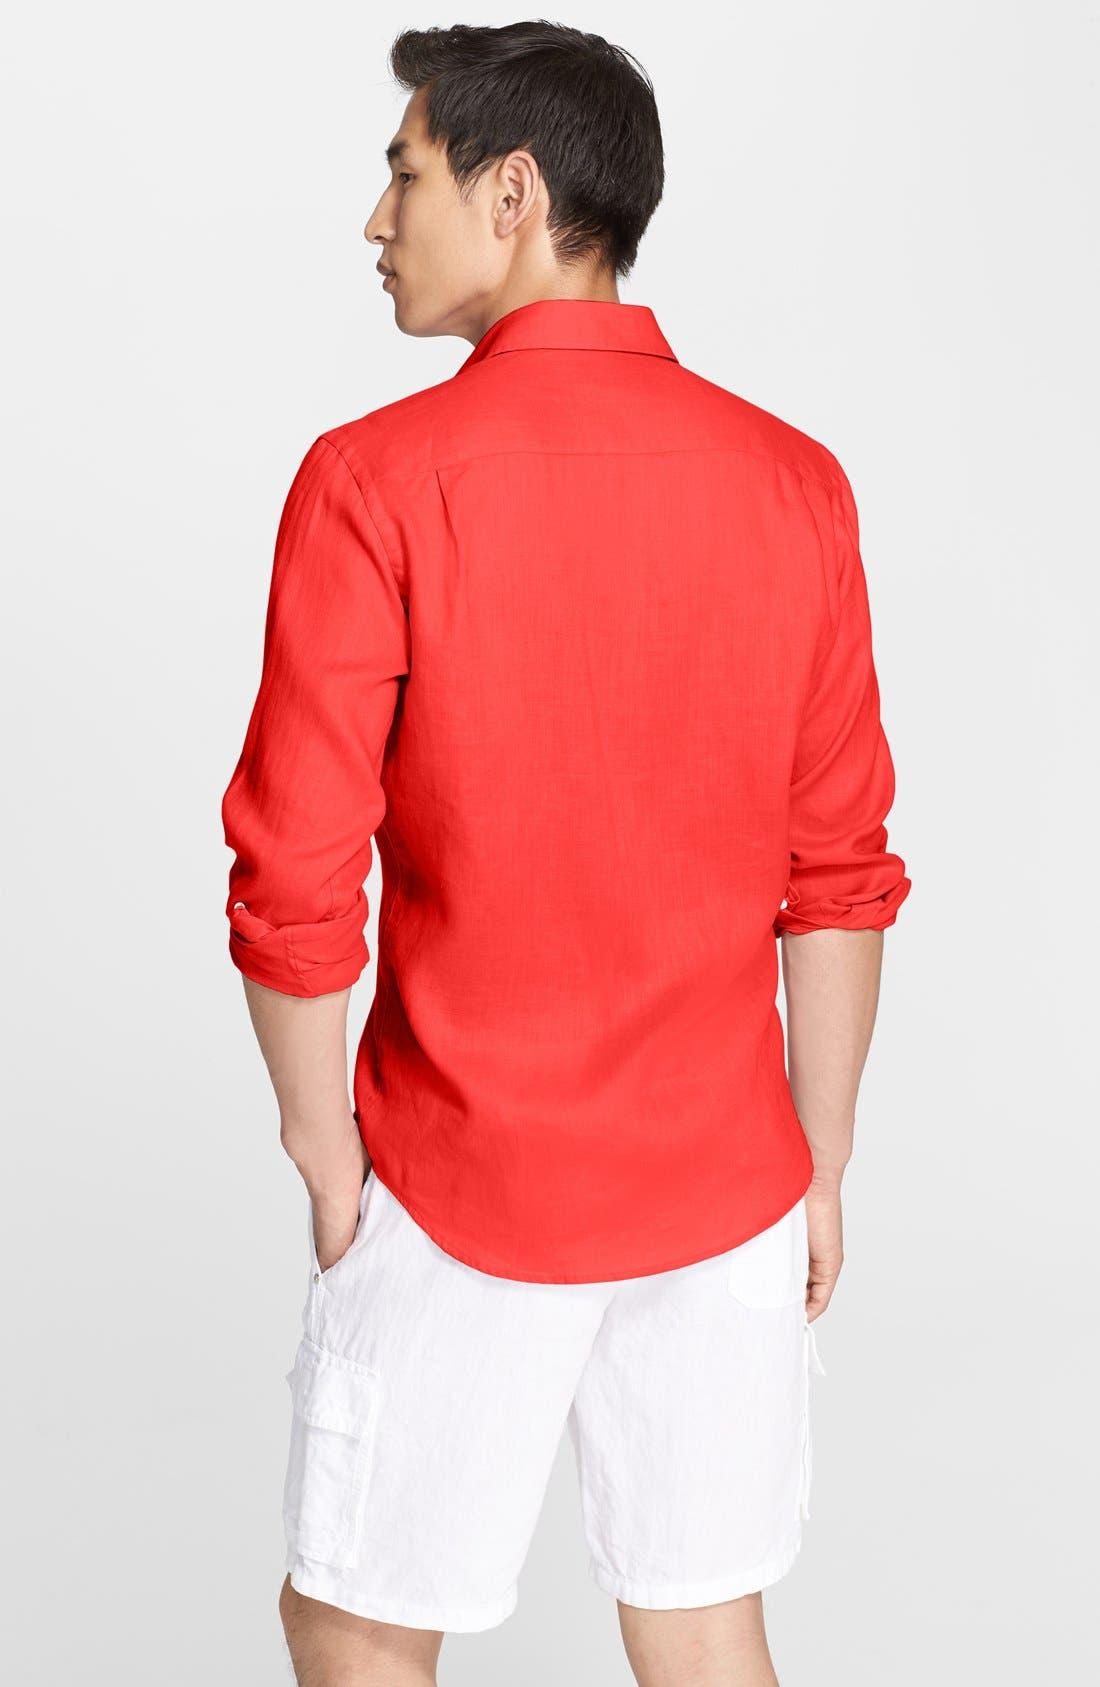 'Caroubier' Linen Shirt,                             Alternate thumbnail 28, color,